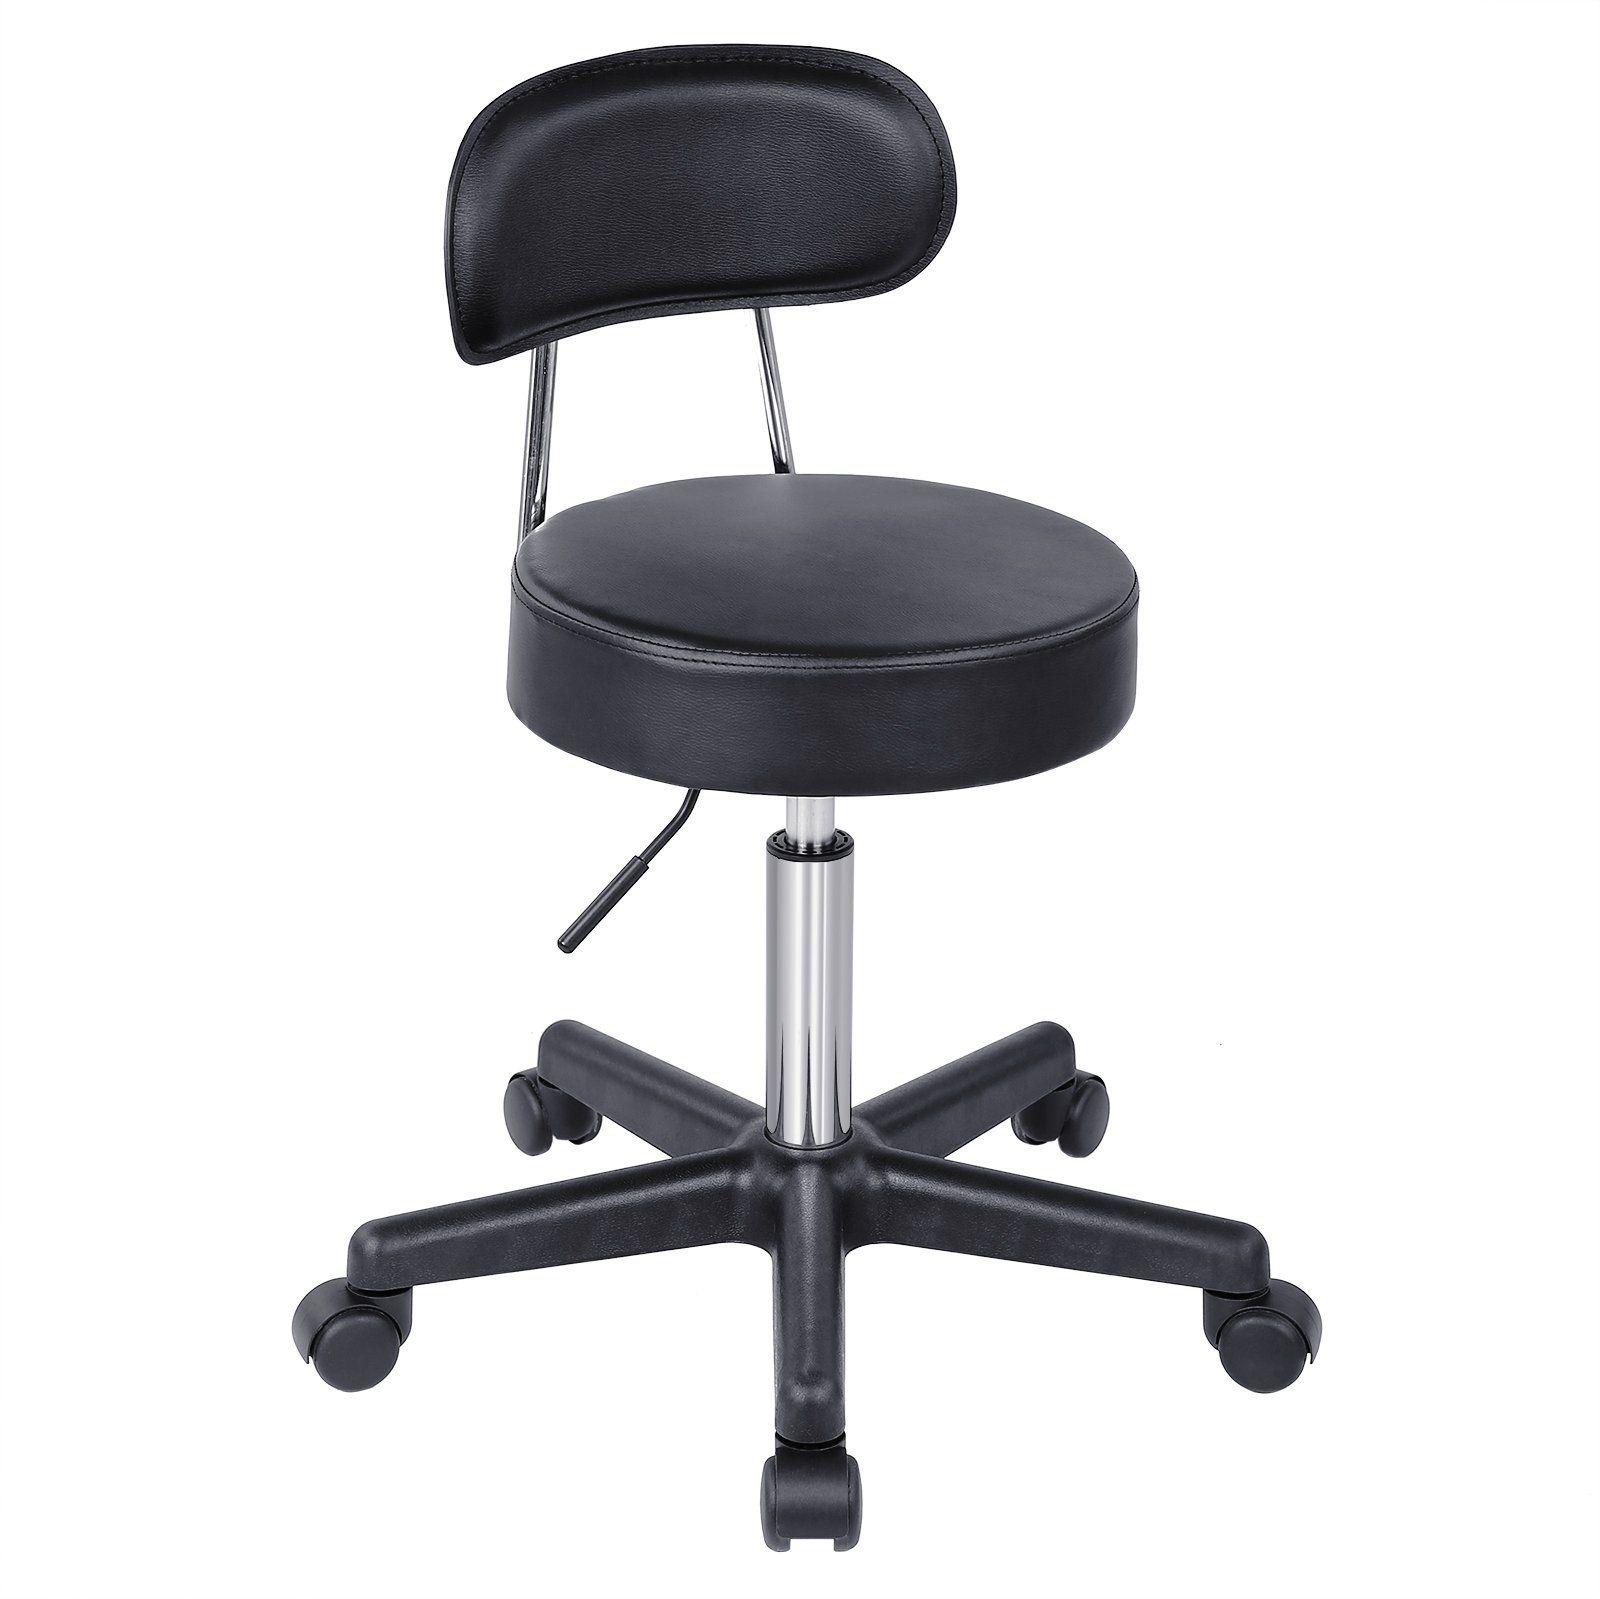 Songmics Adjustable Massage Salon Spa Stool Swivel Rolling Chair